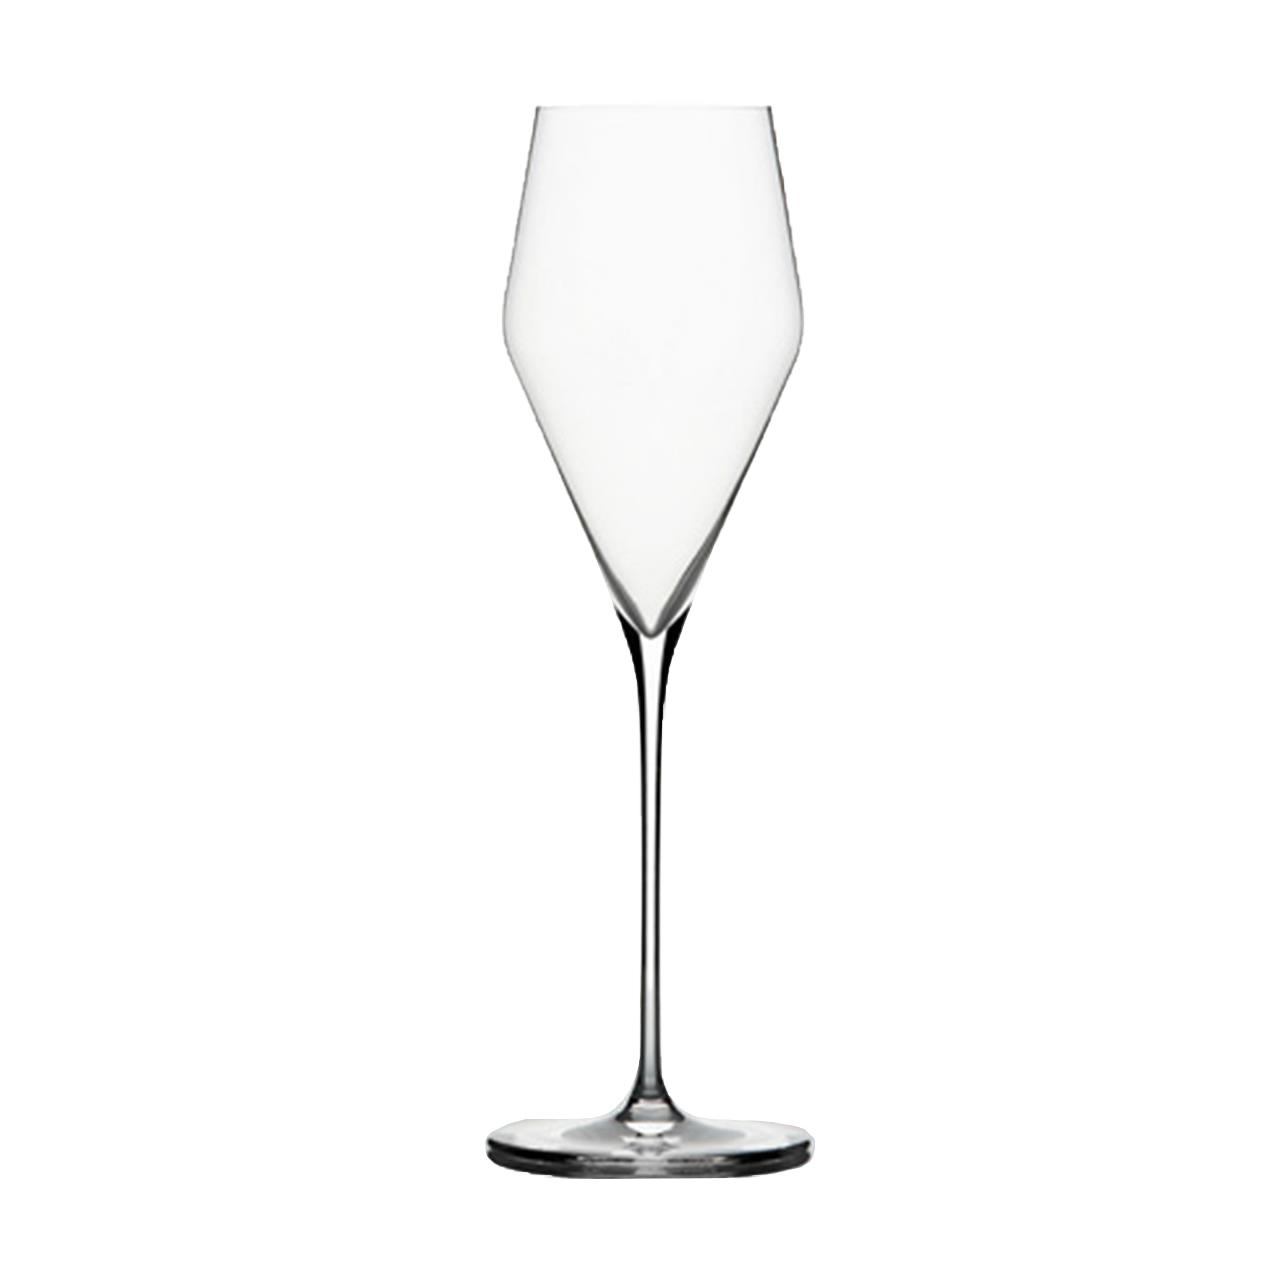 Zalto Gläser  /'Zalto Denk/'Art/' Champagnerglas 6er Set 24 cm